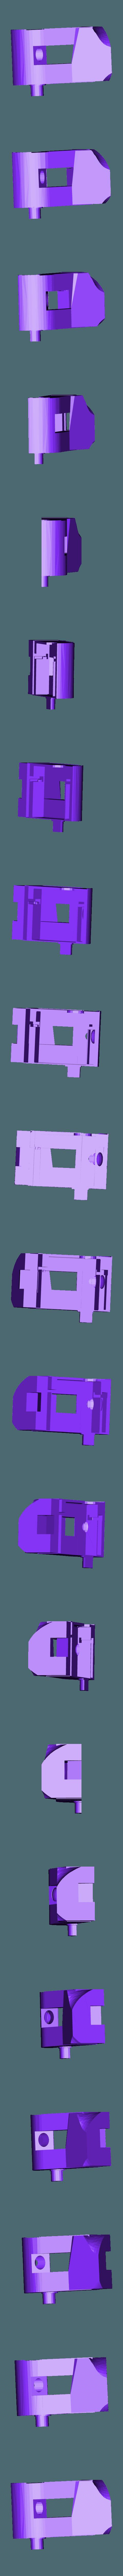 gadgets bicep pt2 right 2print.stl Download free STL file GADGET the robotic Gremlin • 3D printing object, atarka3